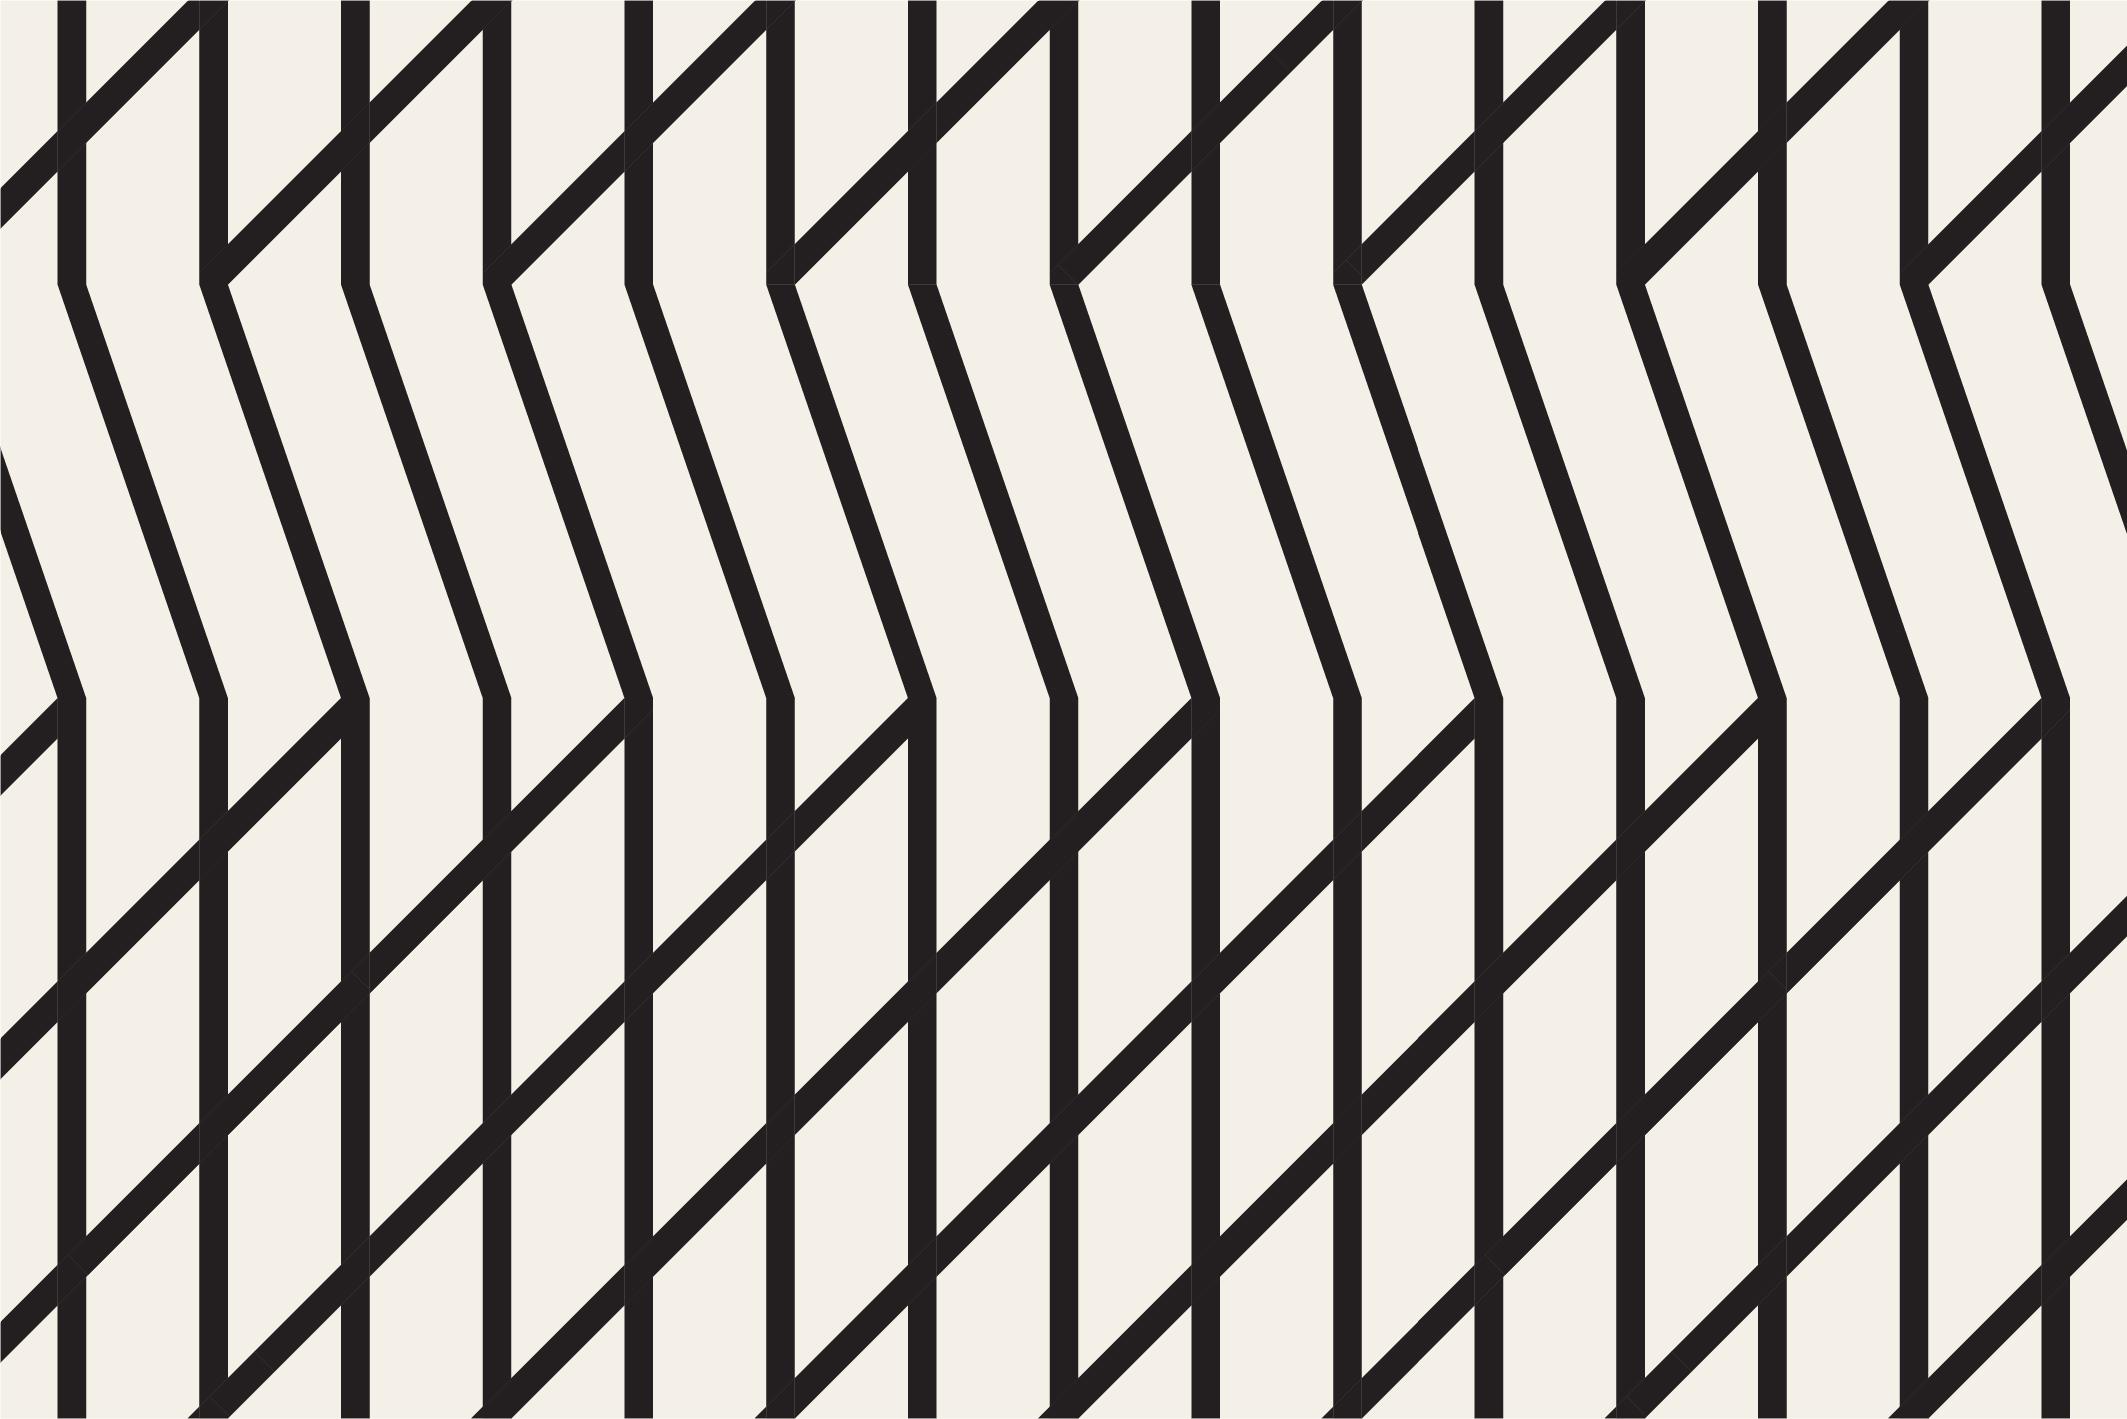 Geometric seamless patterns example image 6